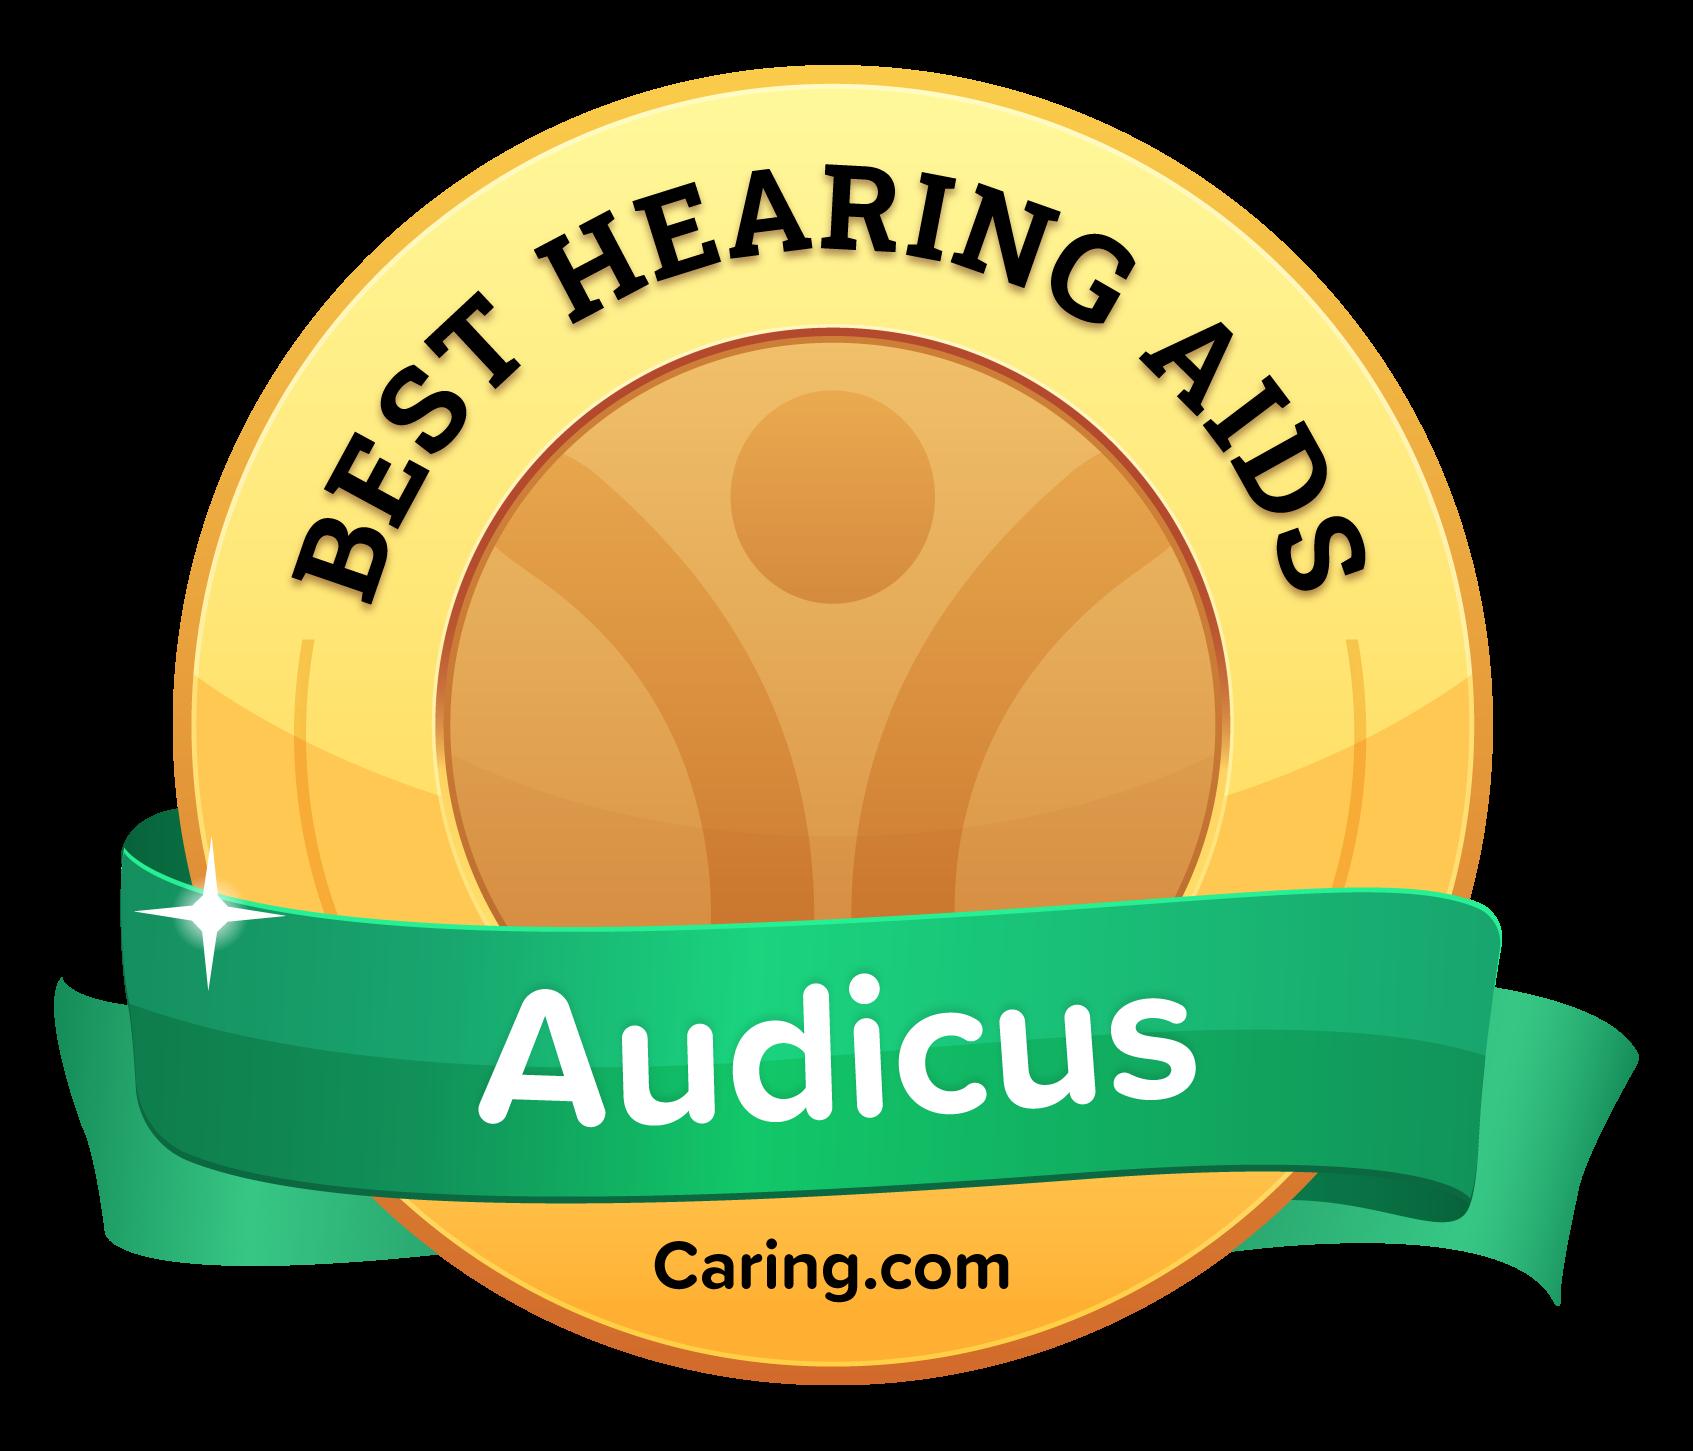 caring-badge